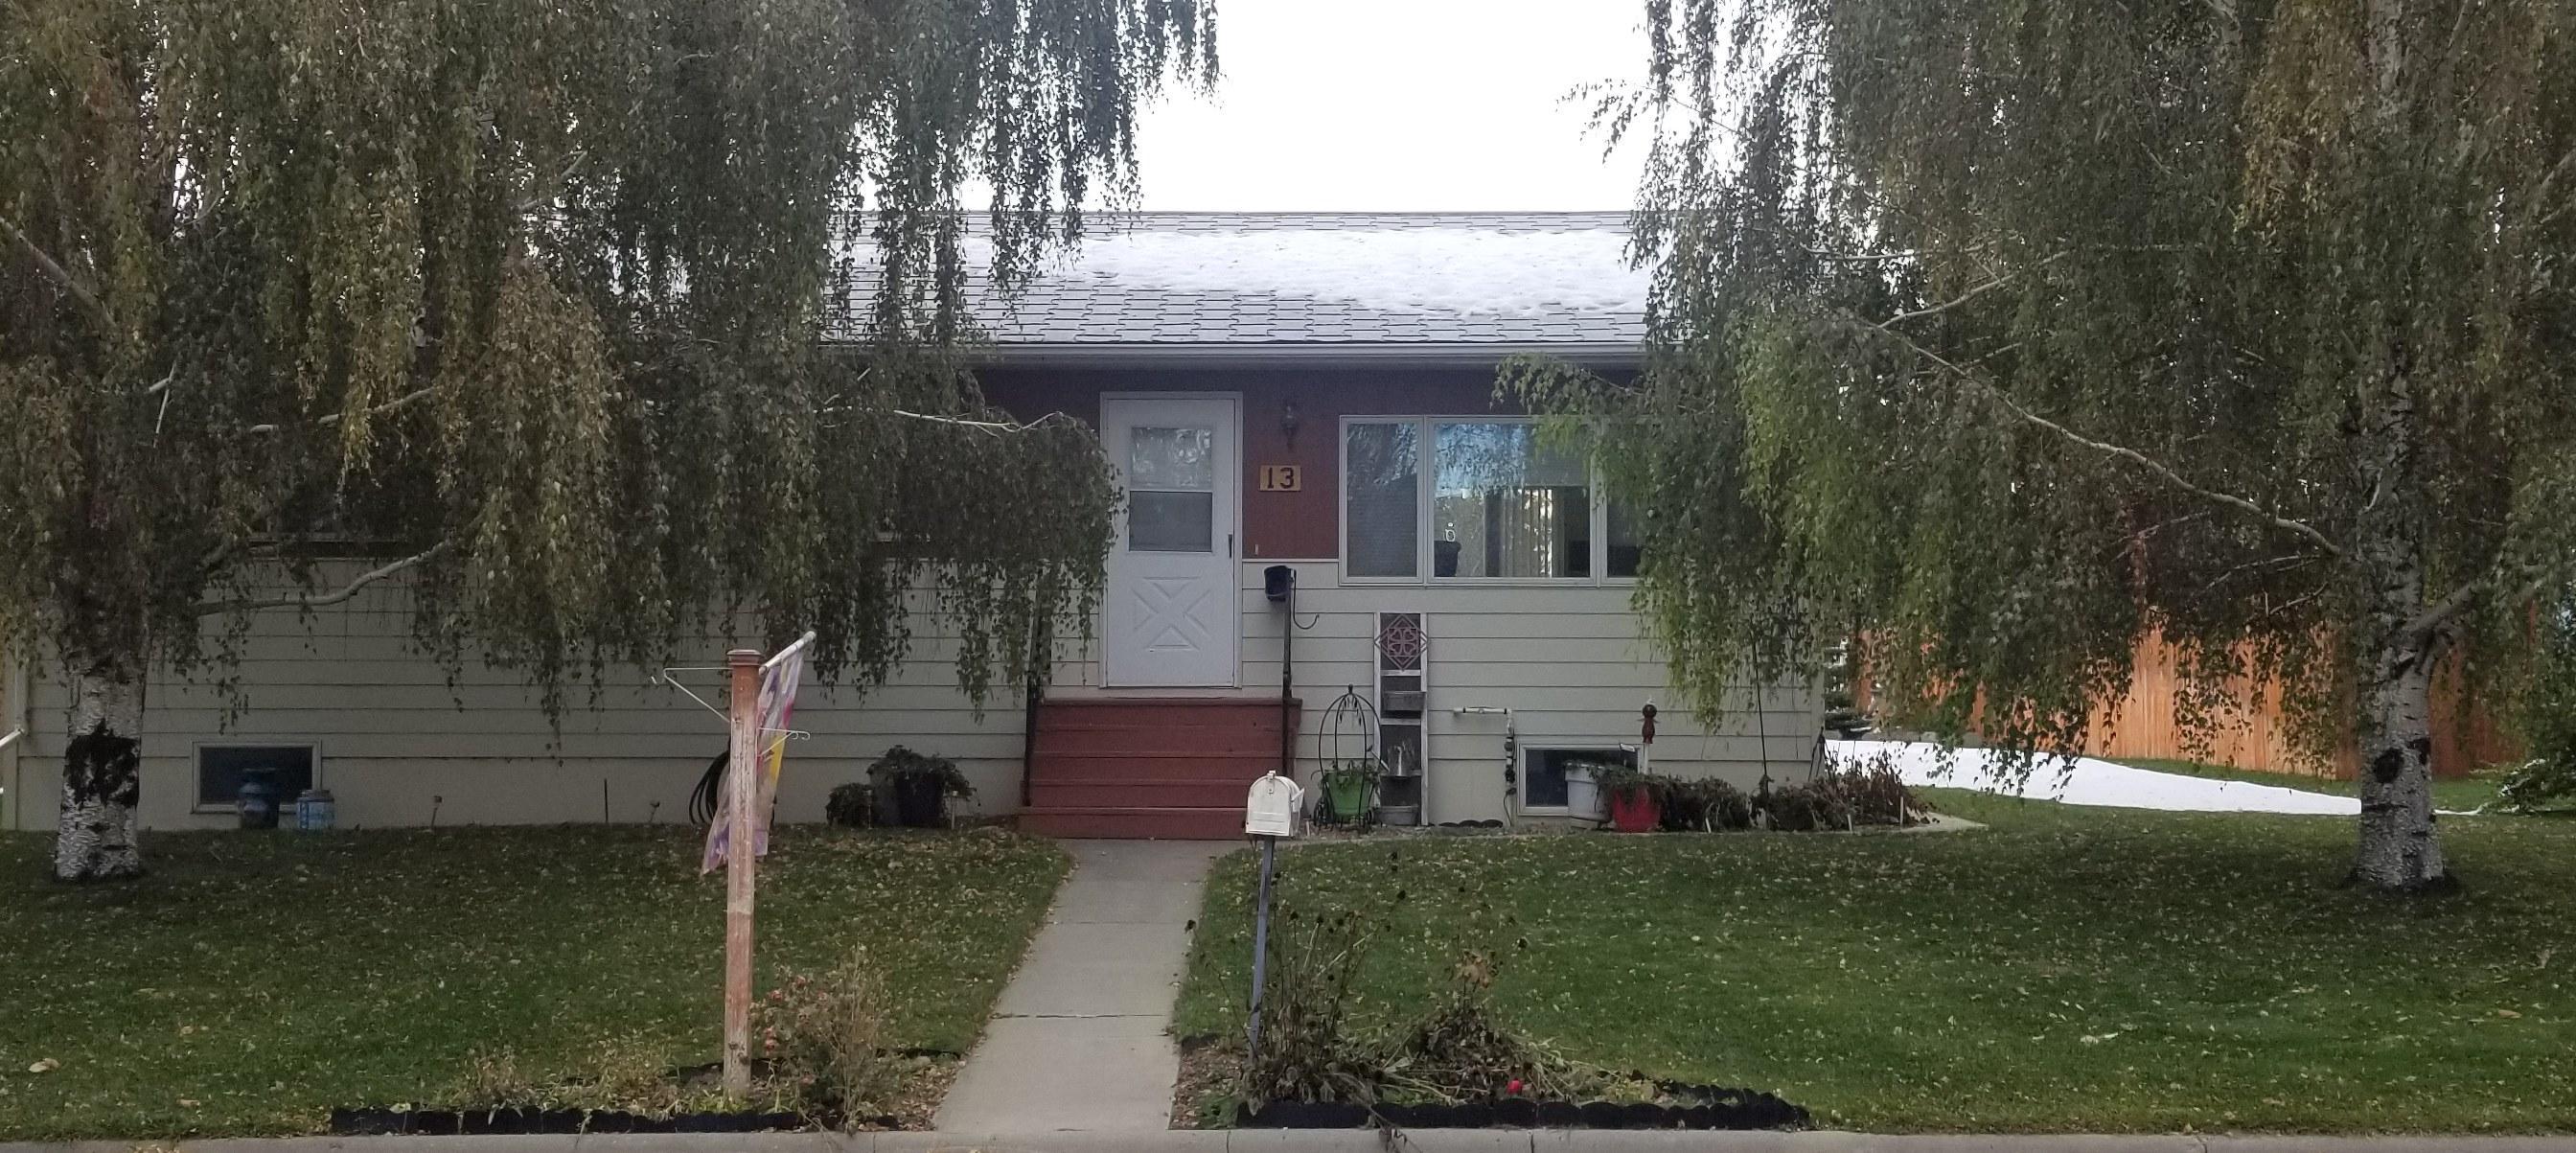 13 N Idaho Street, Conrad, MT 59425